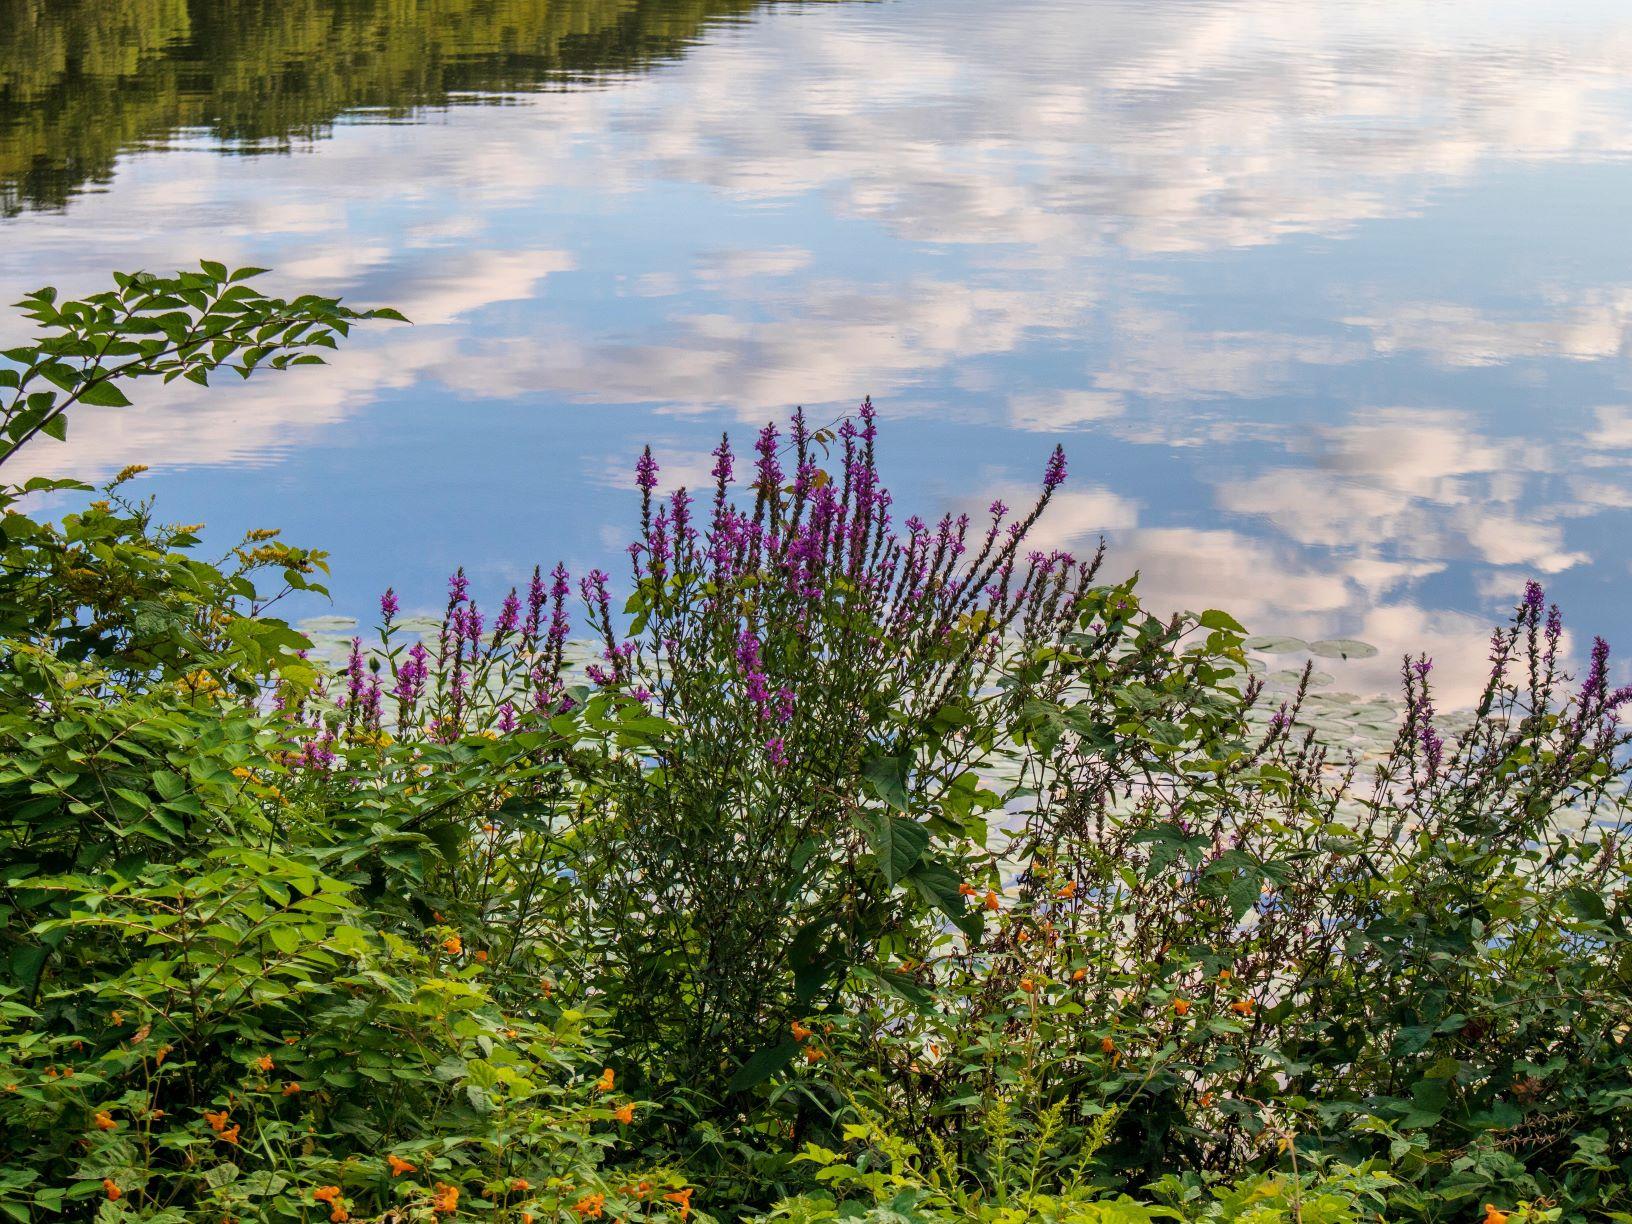 Lakeside Reflections, JHD